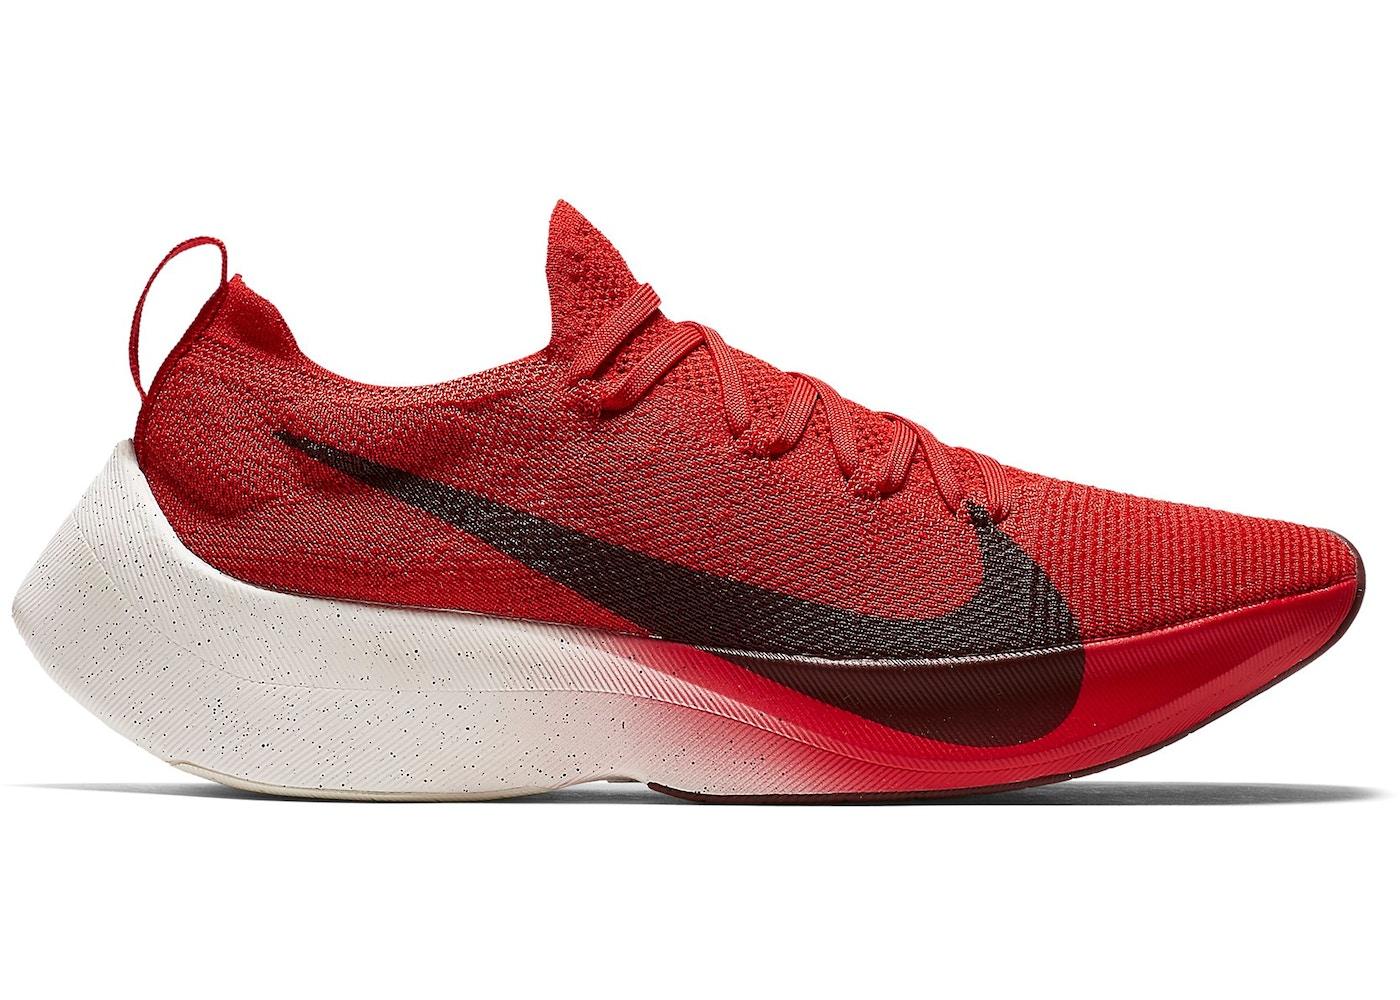 890eeb550365 Nike Vapor Street Flyknit Red - AQ1763-600